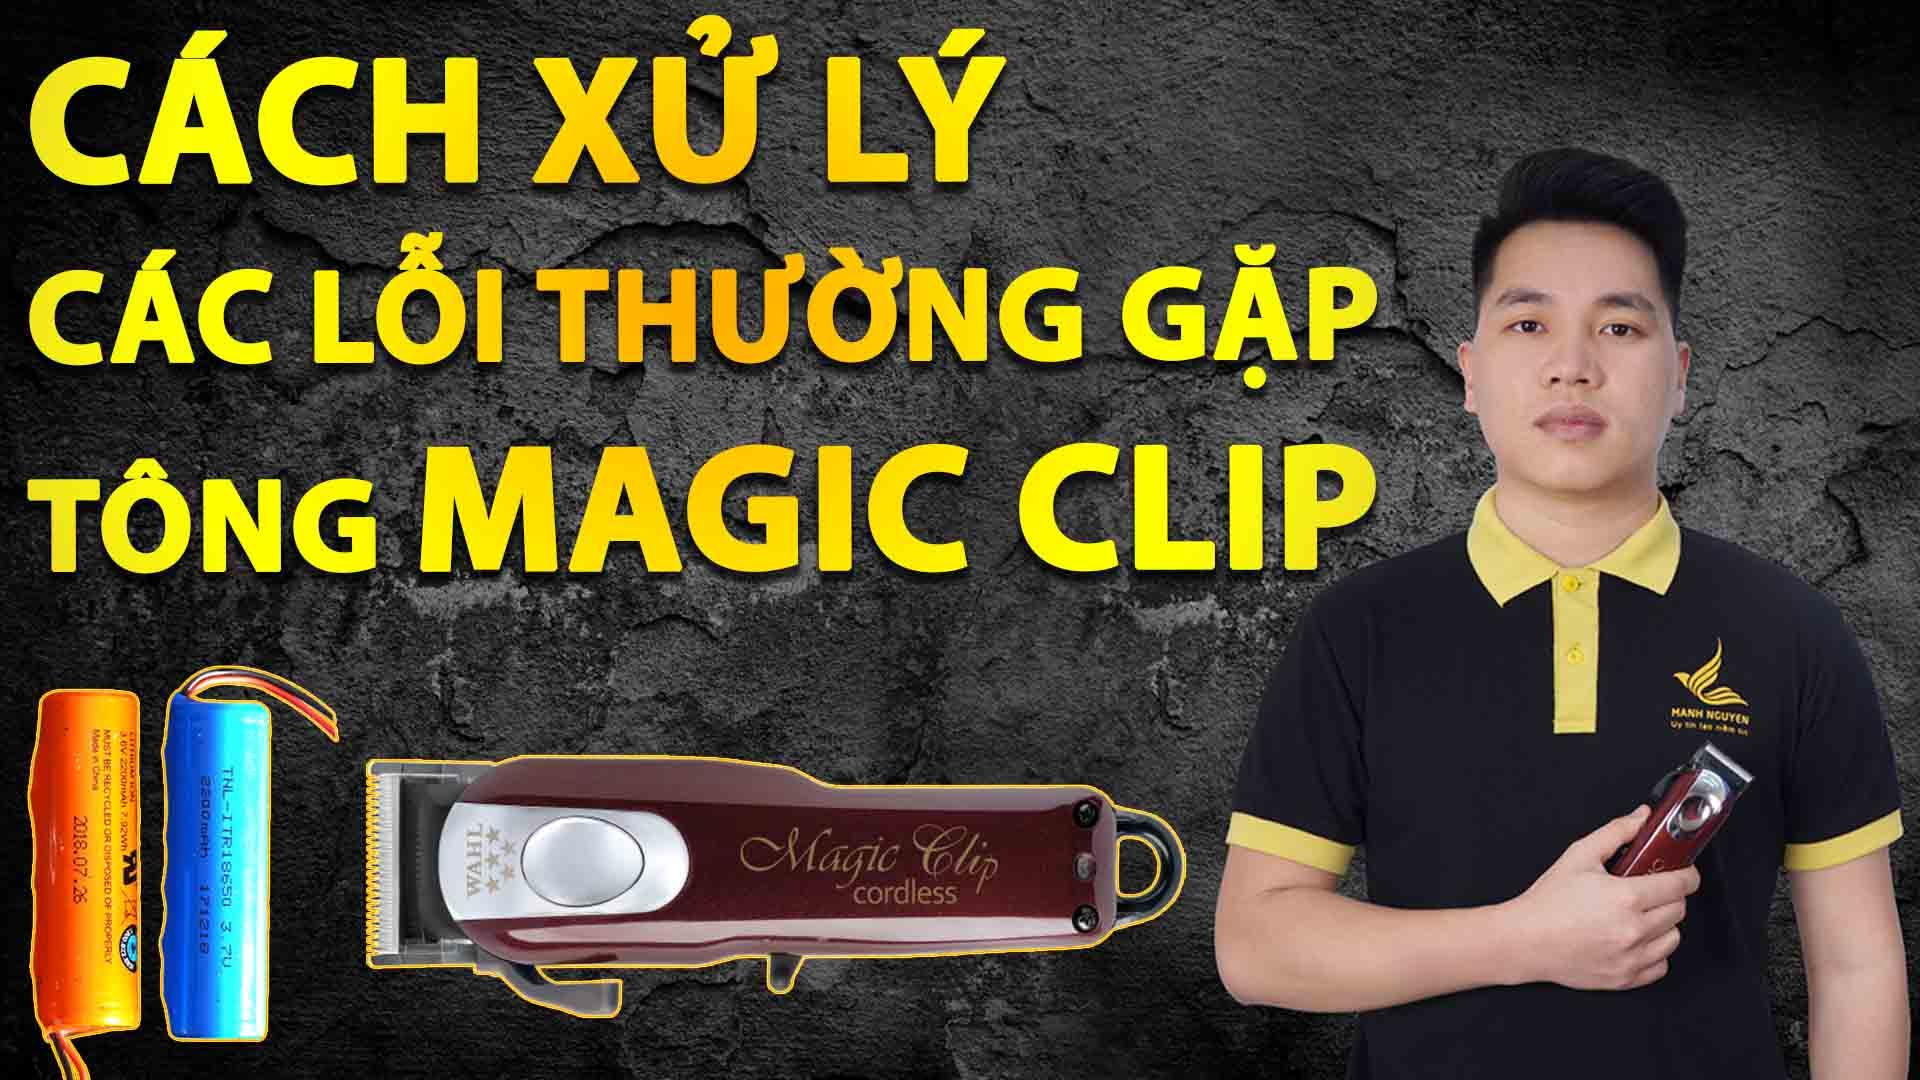 cach xu ly cac loi thuong gap o tong do magic clip